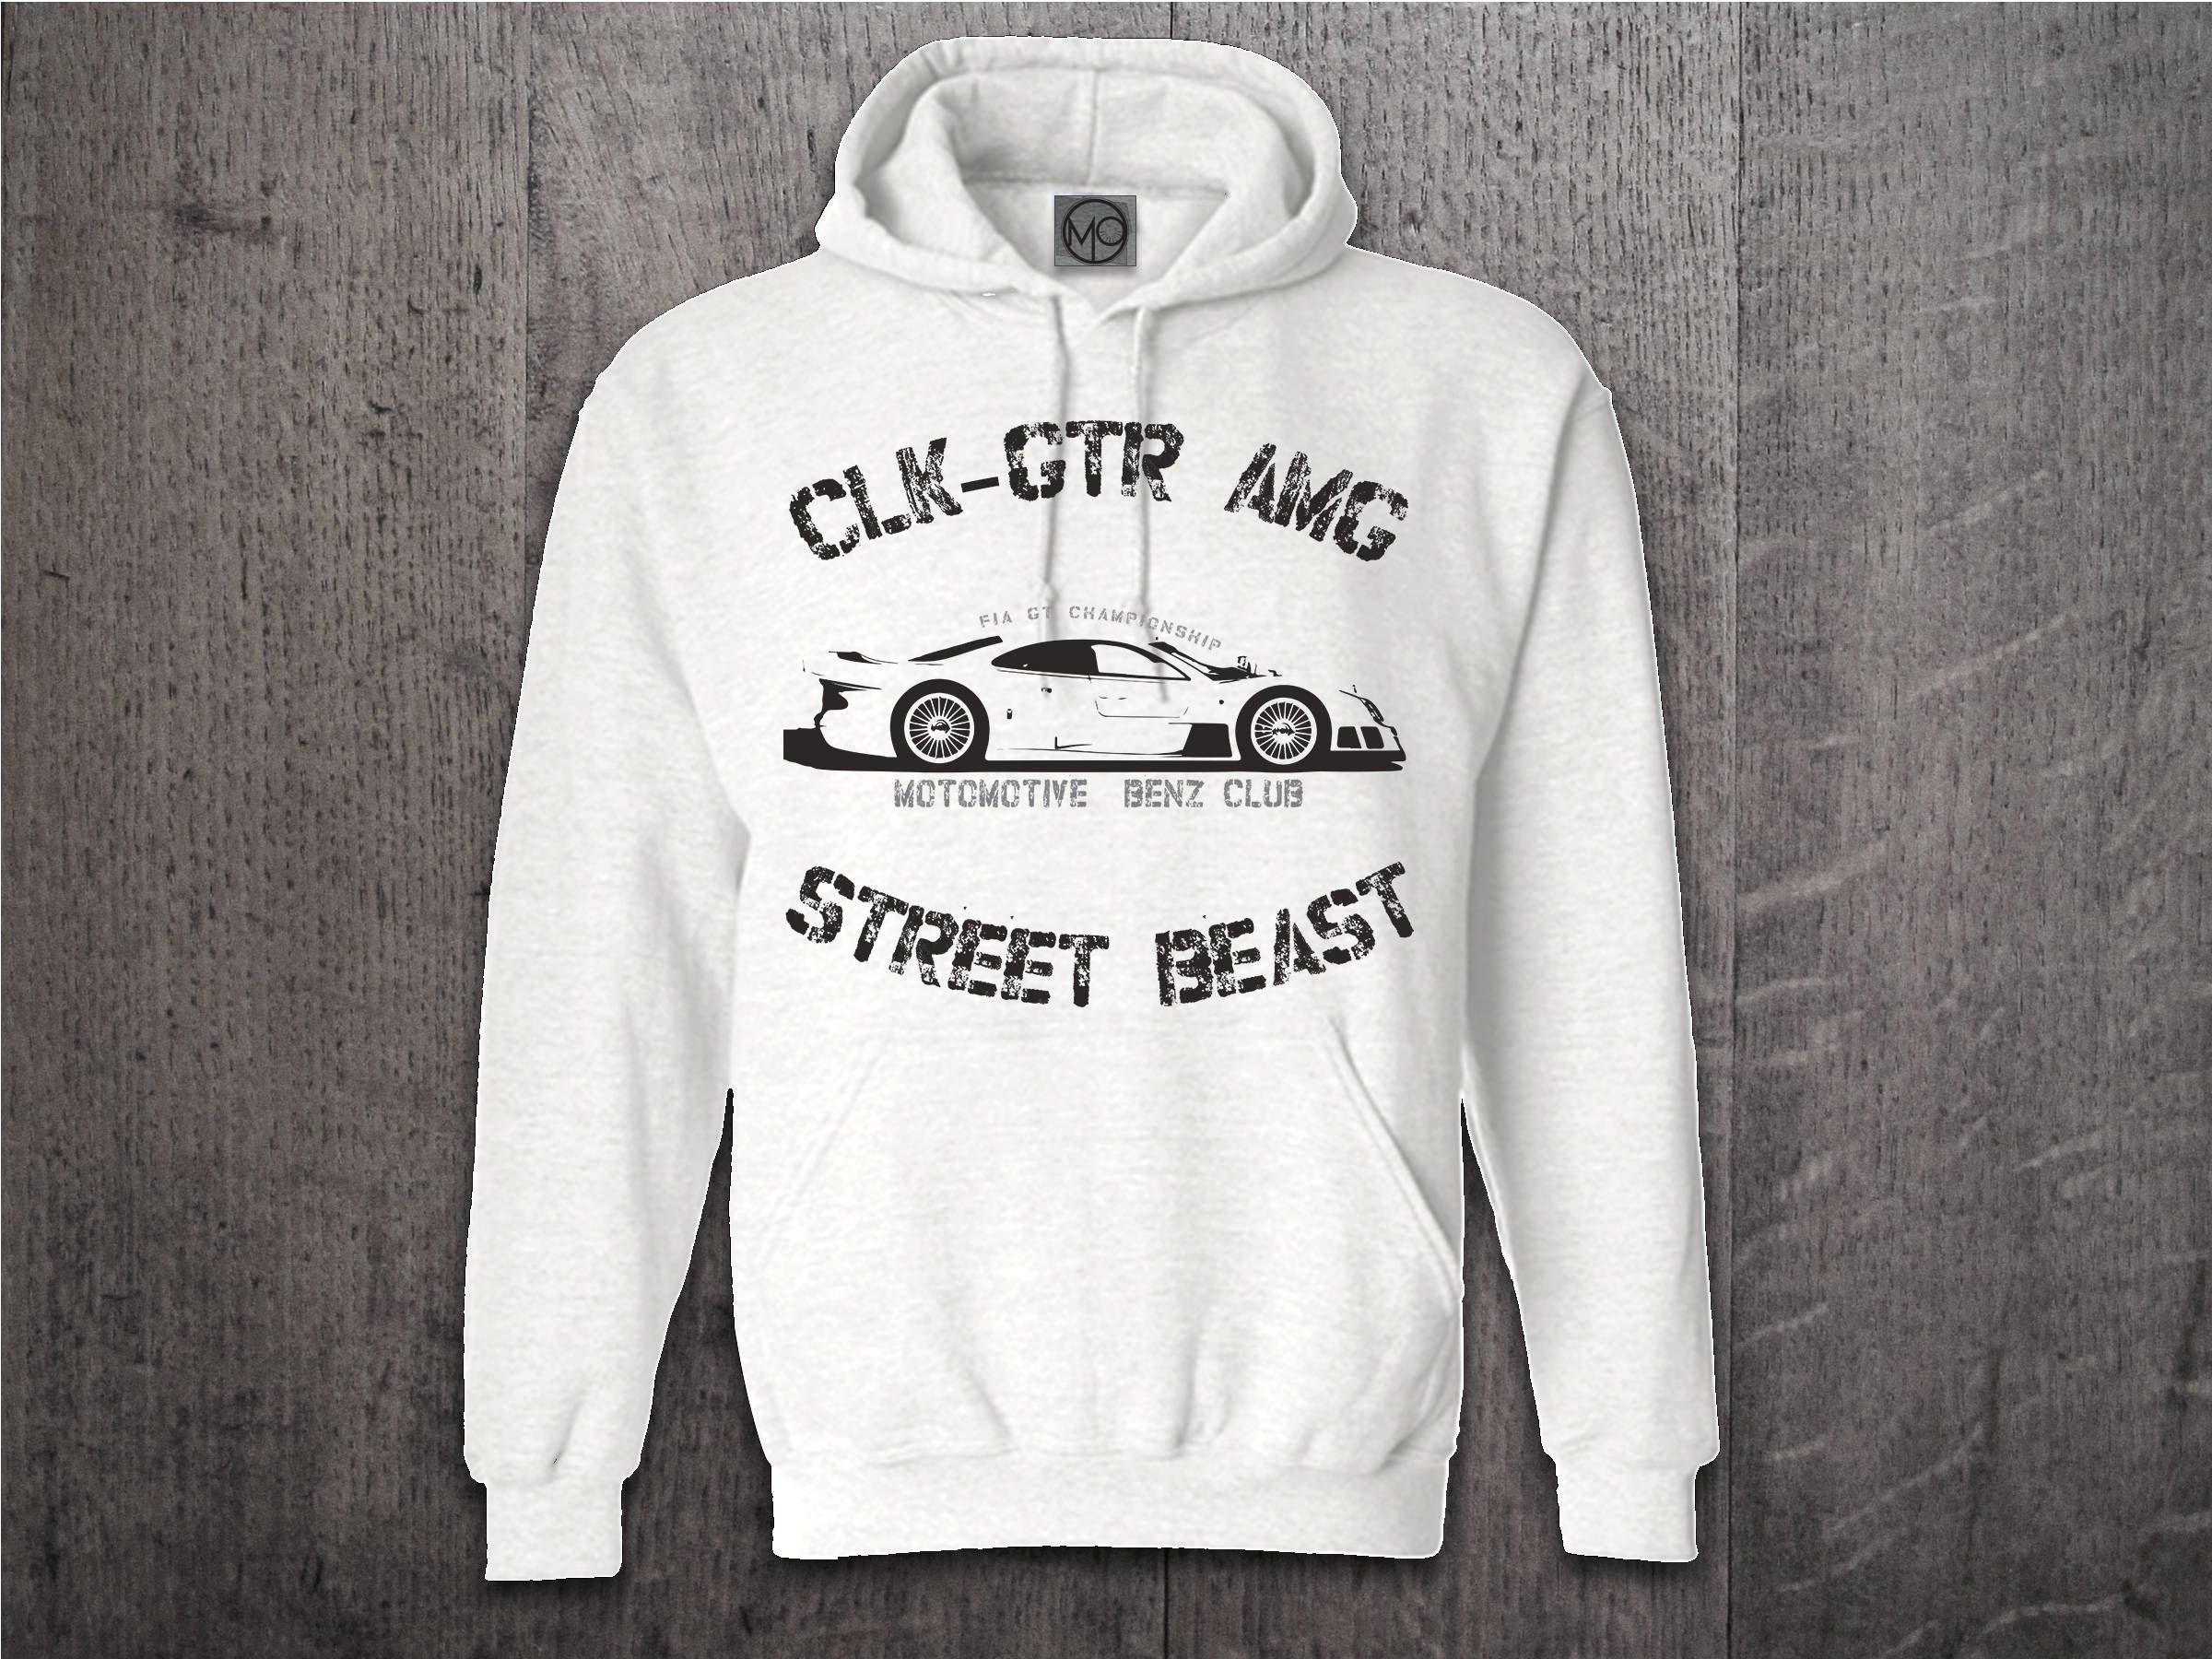 Nissan GTR hoodie, Cars hoodies, Nissan hoodies, GTR sweaters, Men hoodies, funny hoodies, Godzilla gtr t shirts Unisex Hoodies, GTR shirts